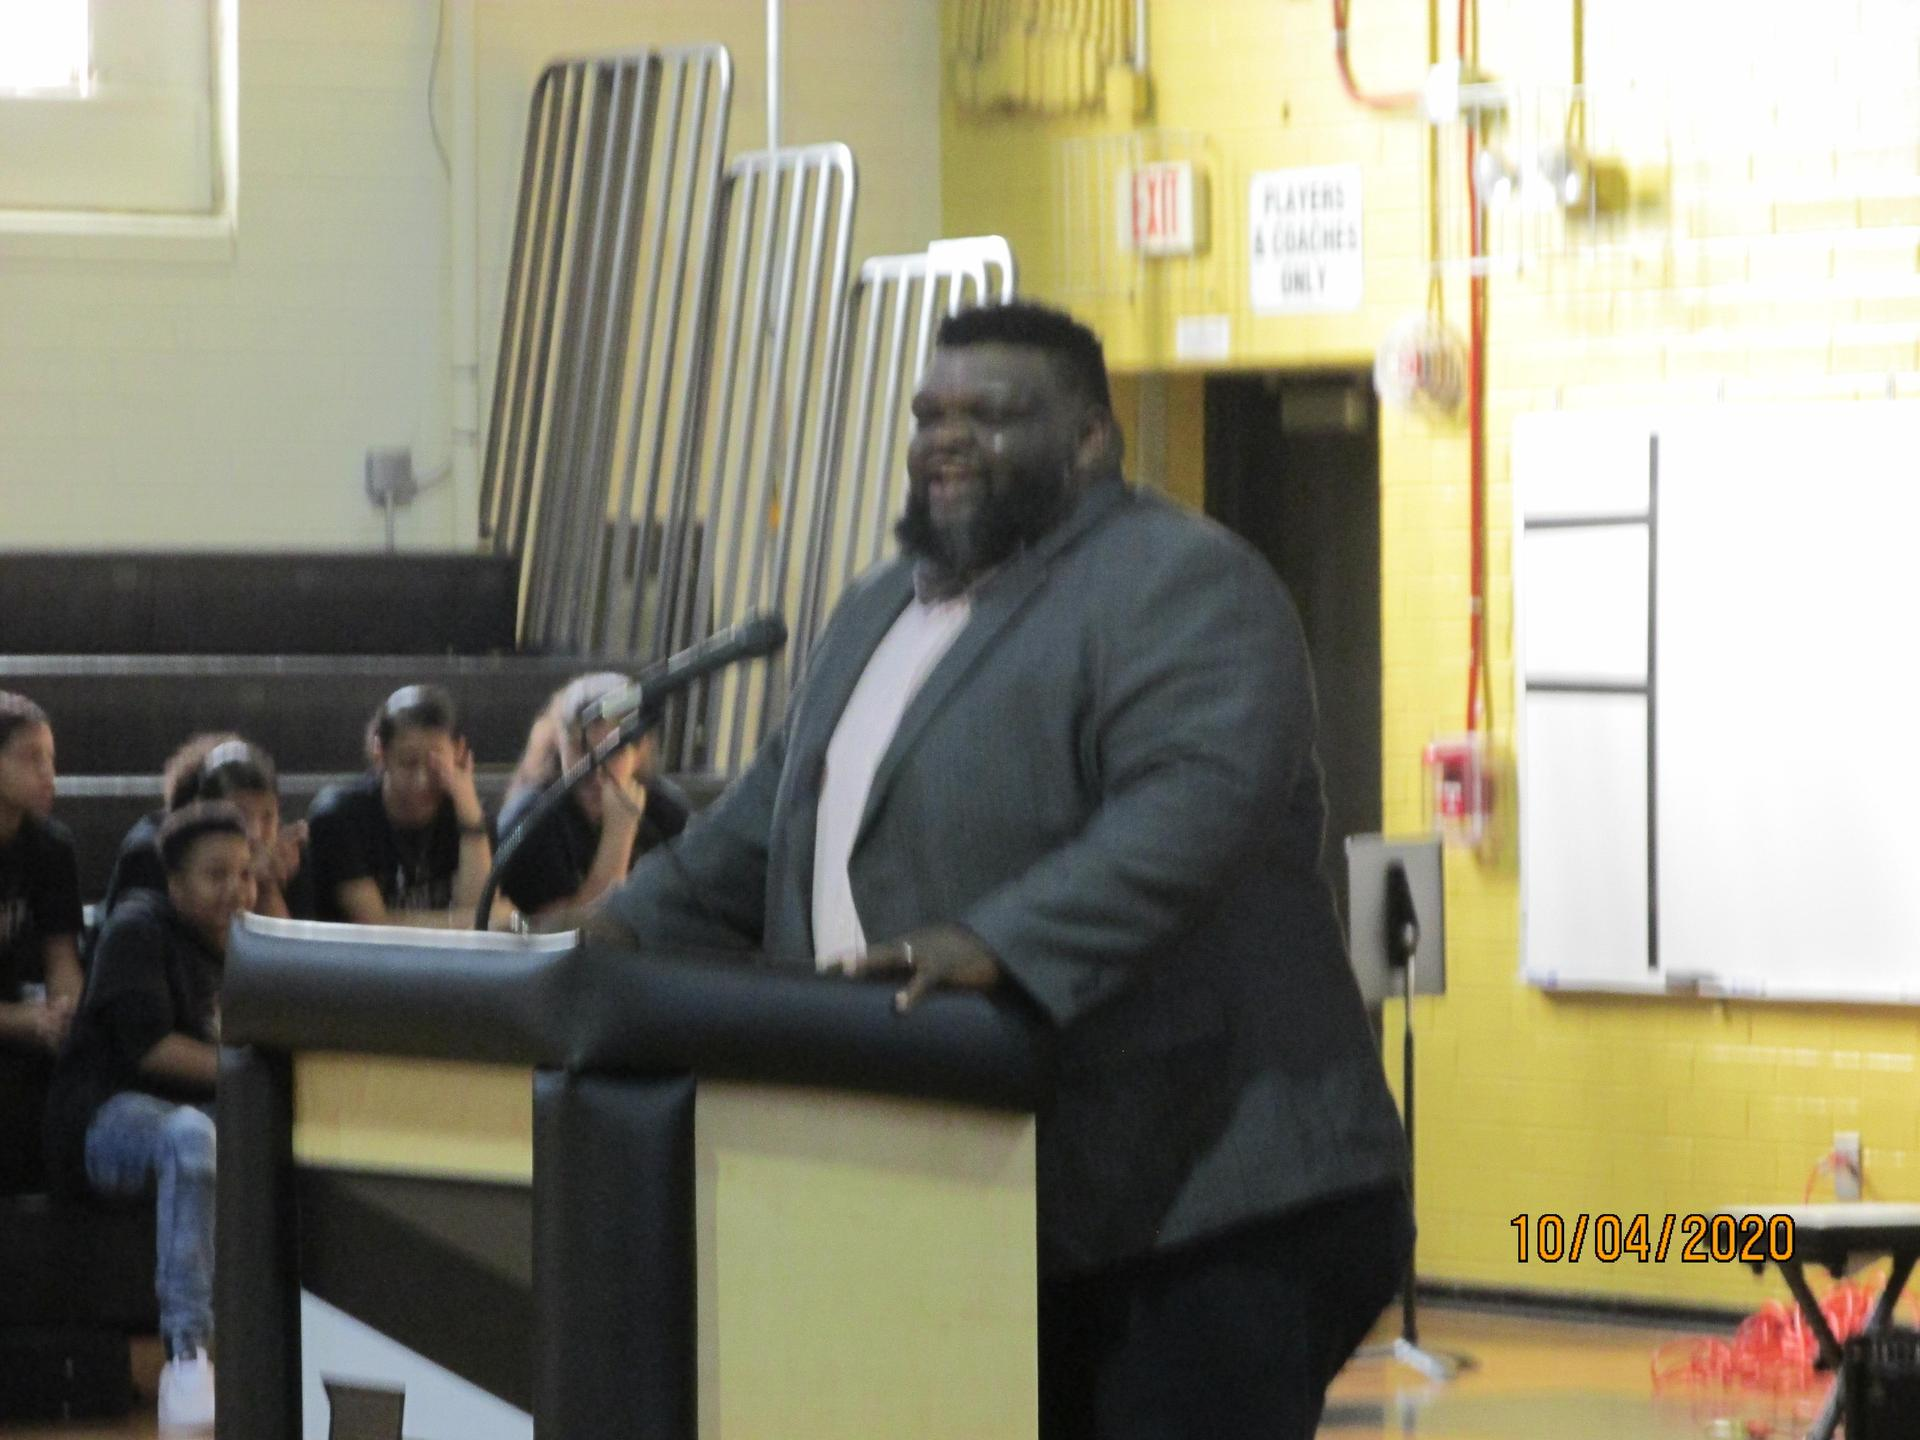 Mr. Brunson, Principal, at the microphone